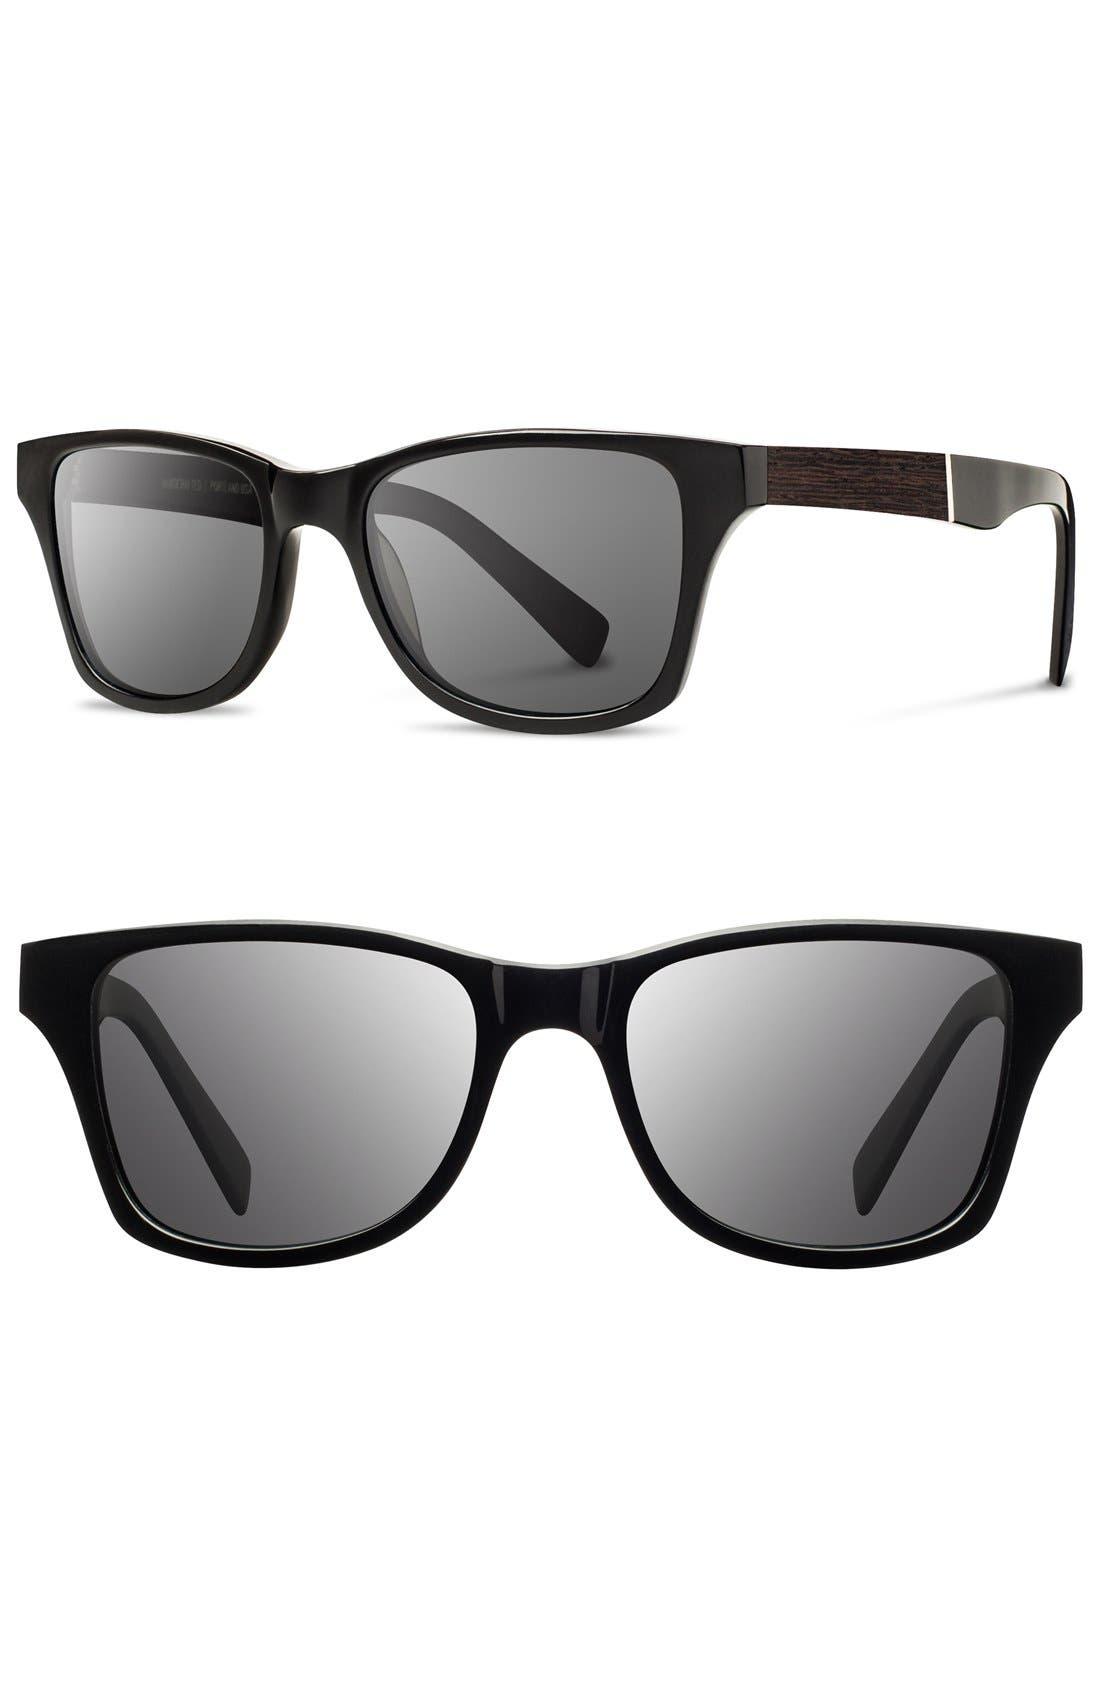 SHWOOD Canby 53mm Wood Sunglasses